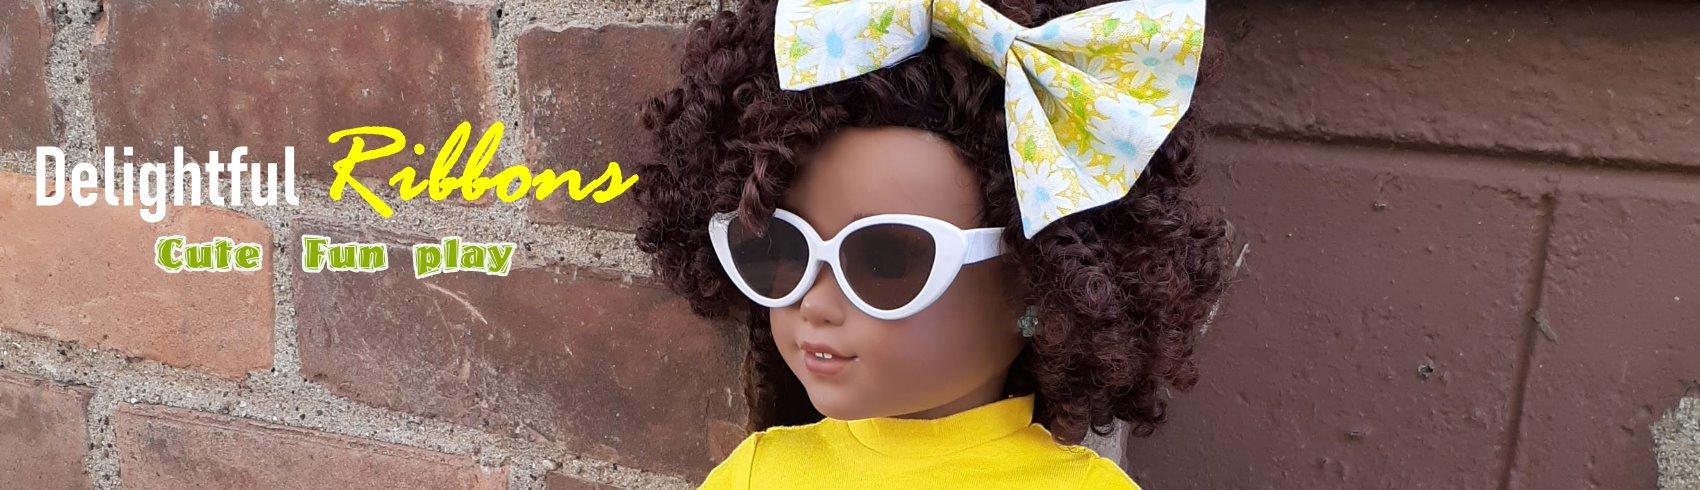 doll-clothes-header.jpg